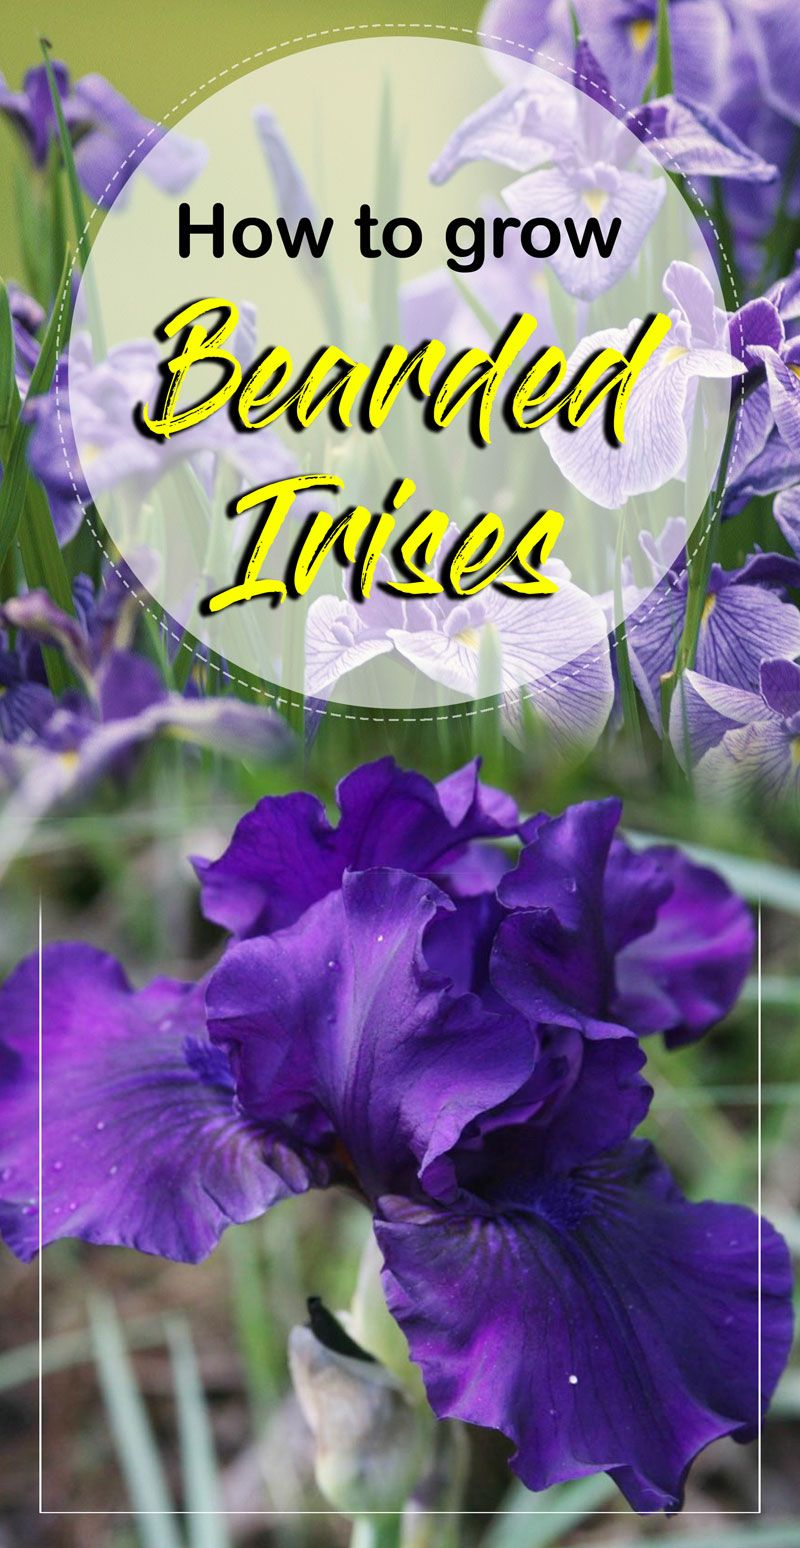 How To Grow Iris Flowers Bearded Iris Growing Irises Naturebring Growing Irises Iris Flowers Iris Flowers Garden